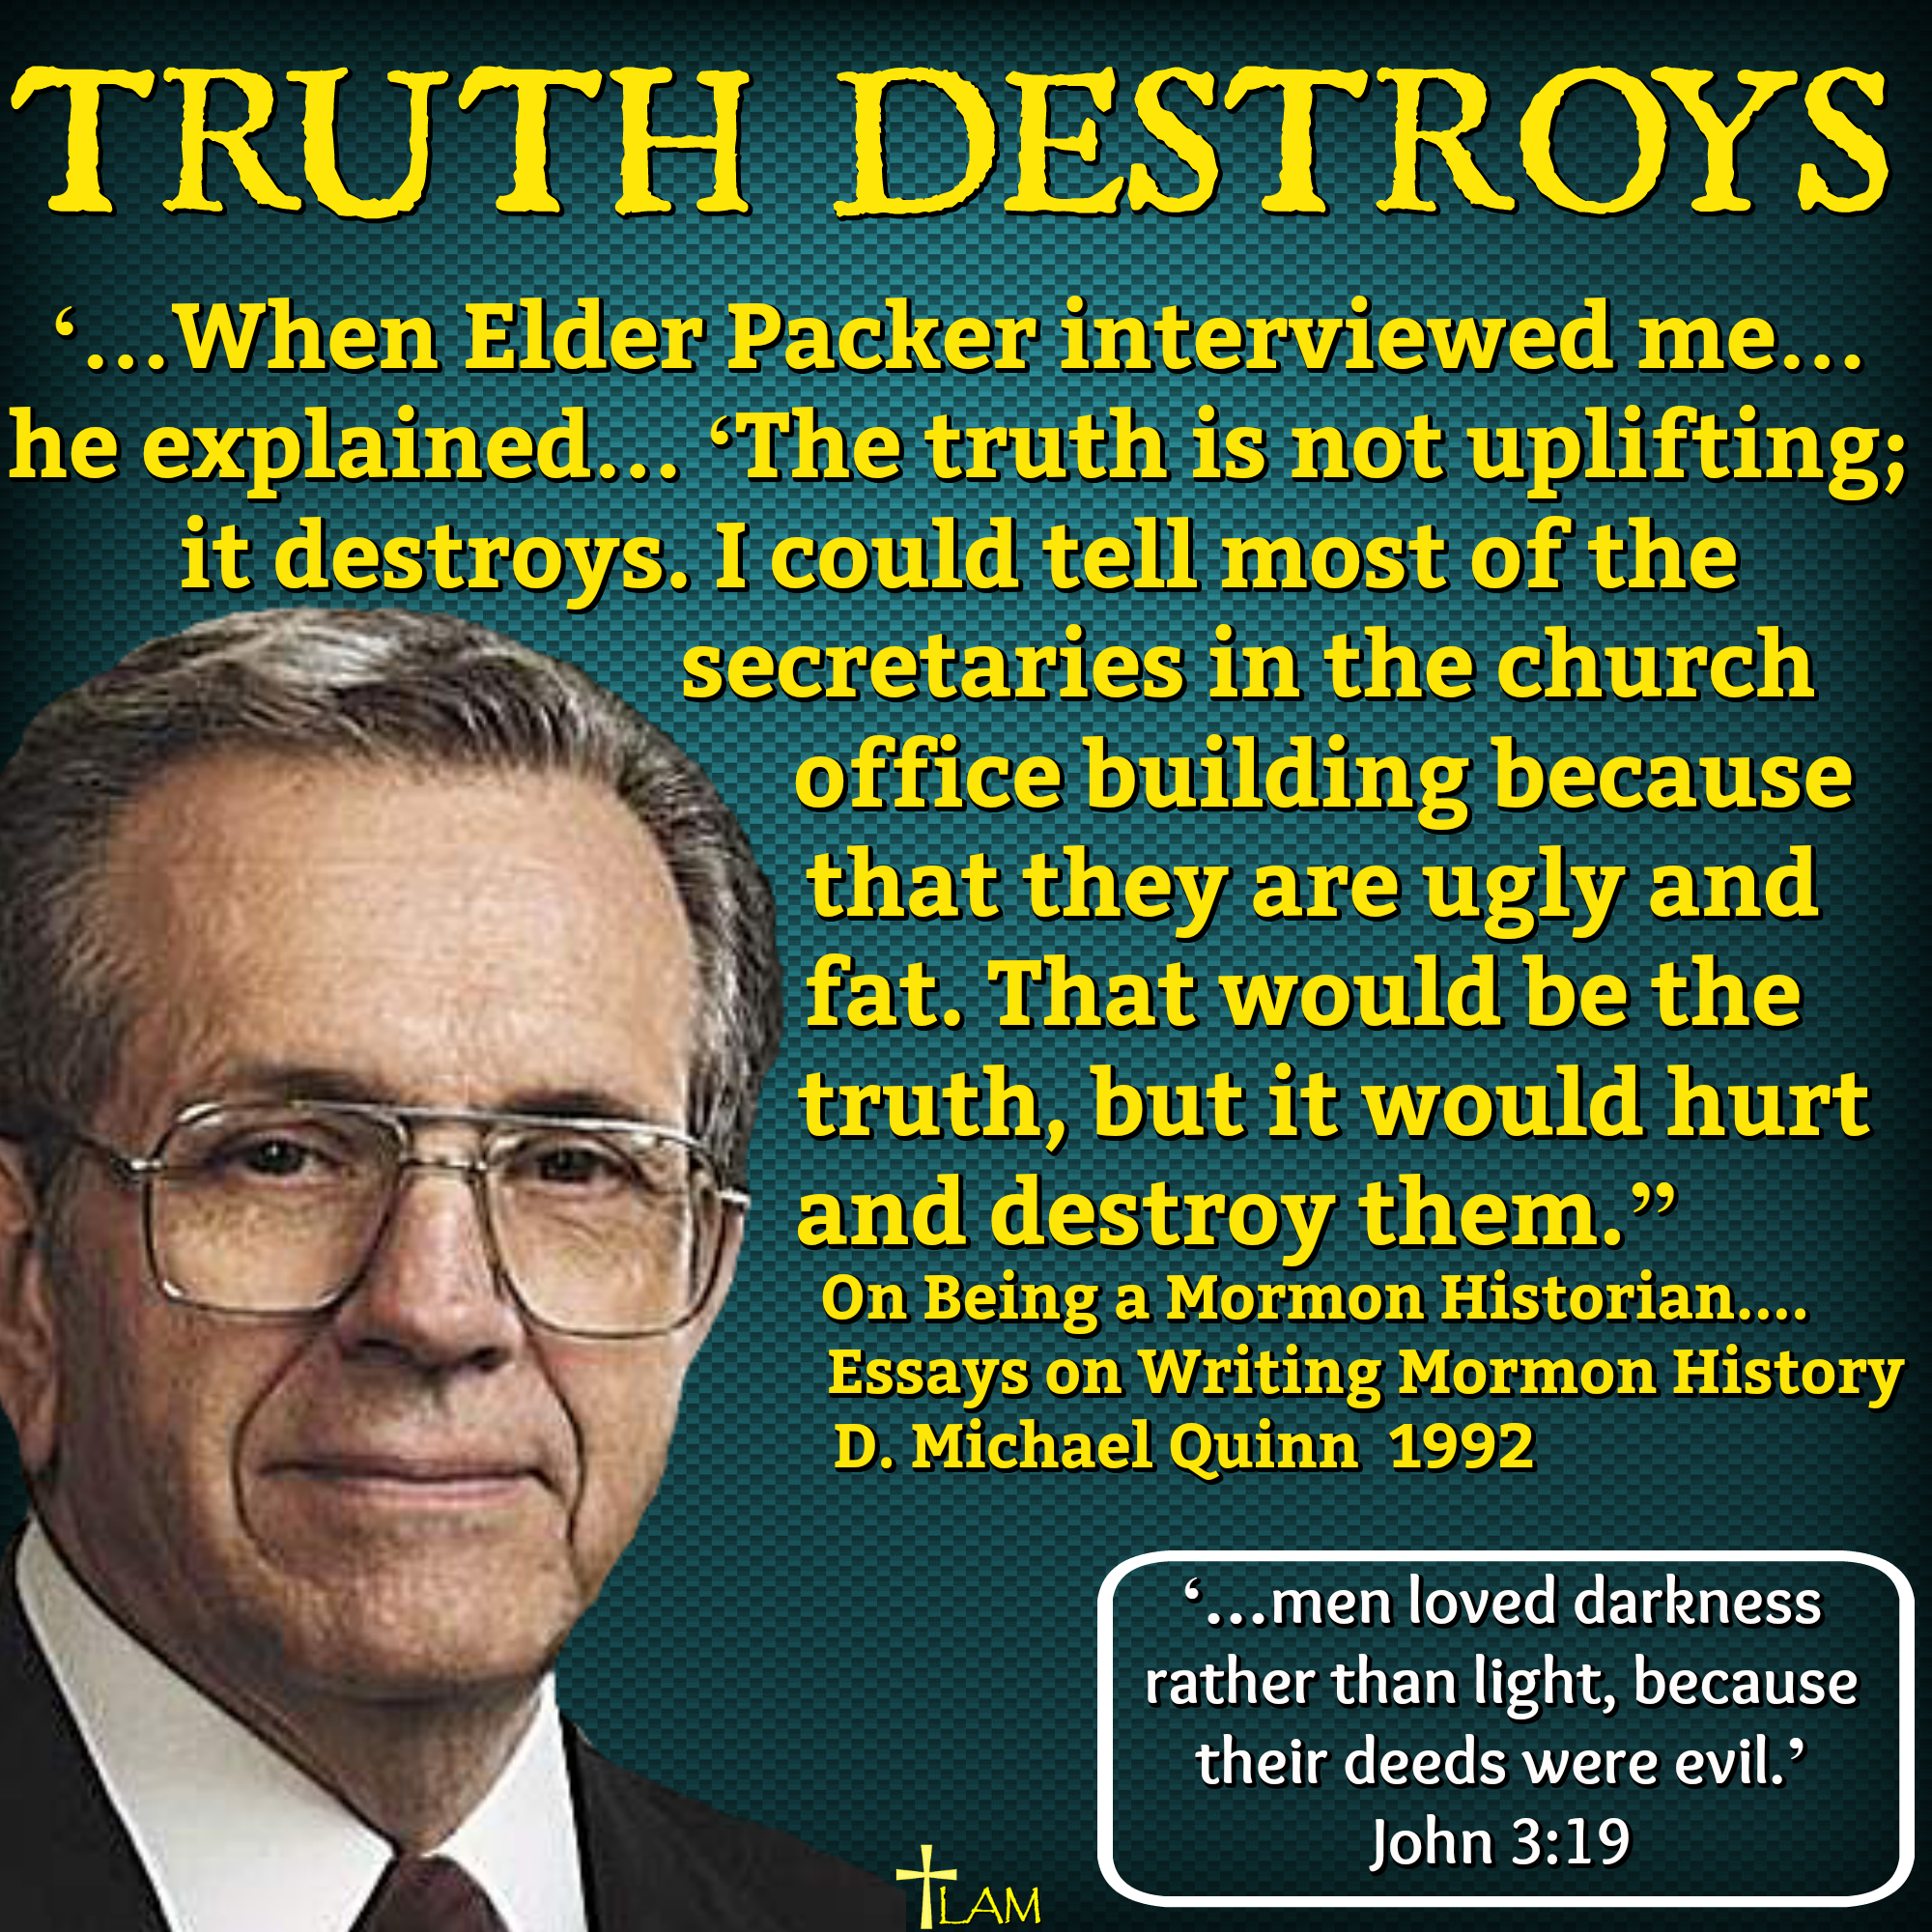 010 Truth Destroys Lds Essays Essay Unbelievable Seer Stone Mother In Heaven Joseph Smith Full